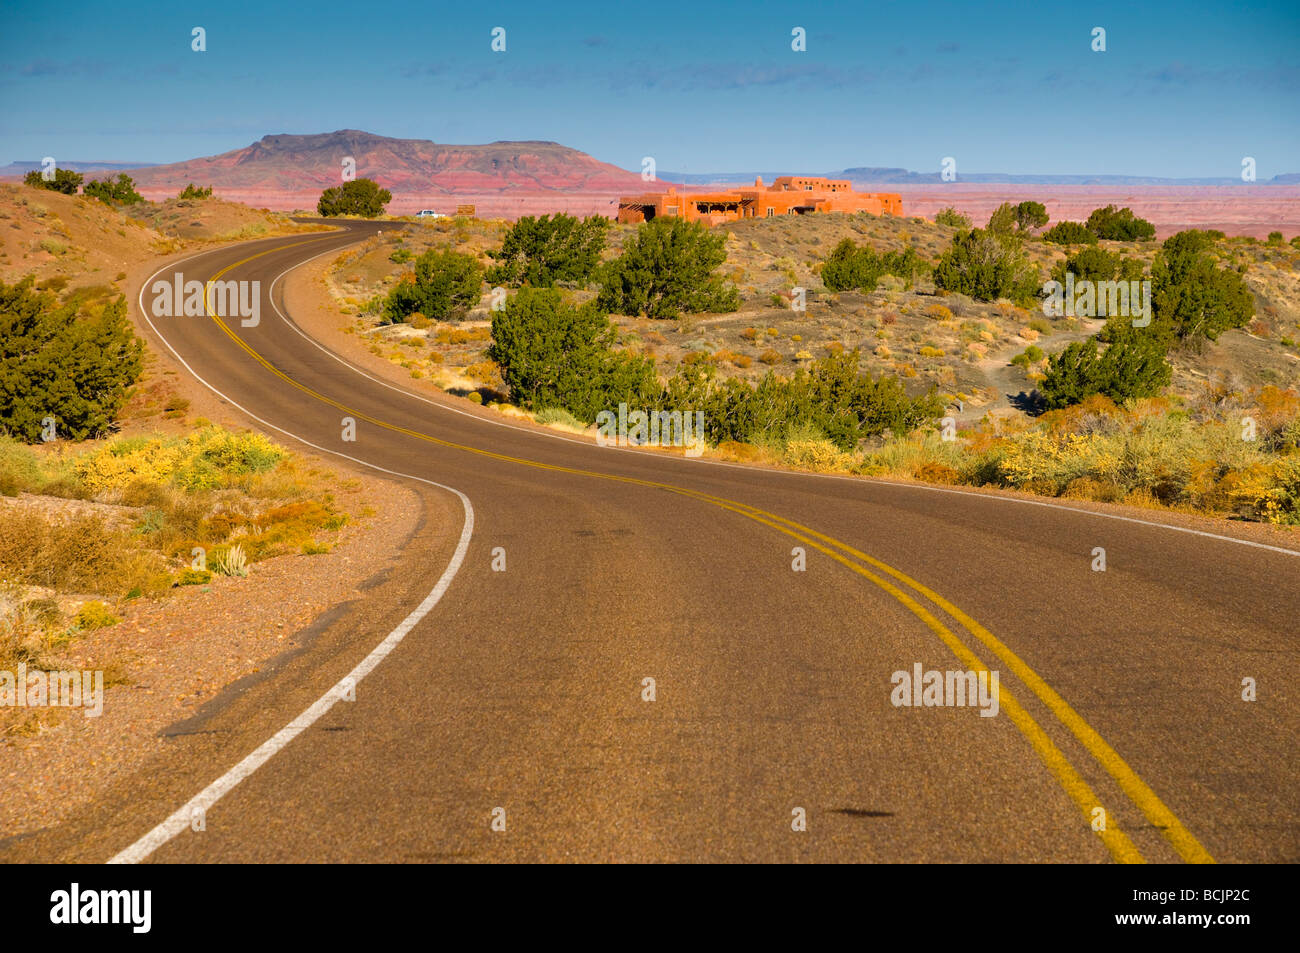 USA, Arizona, Petrified Forest National Park - Stock Image